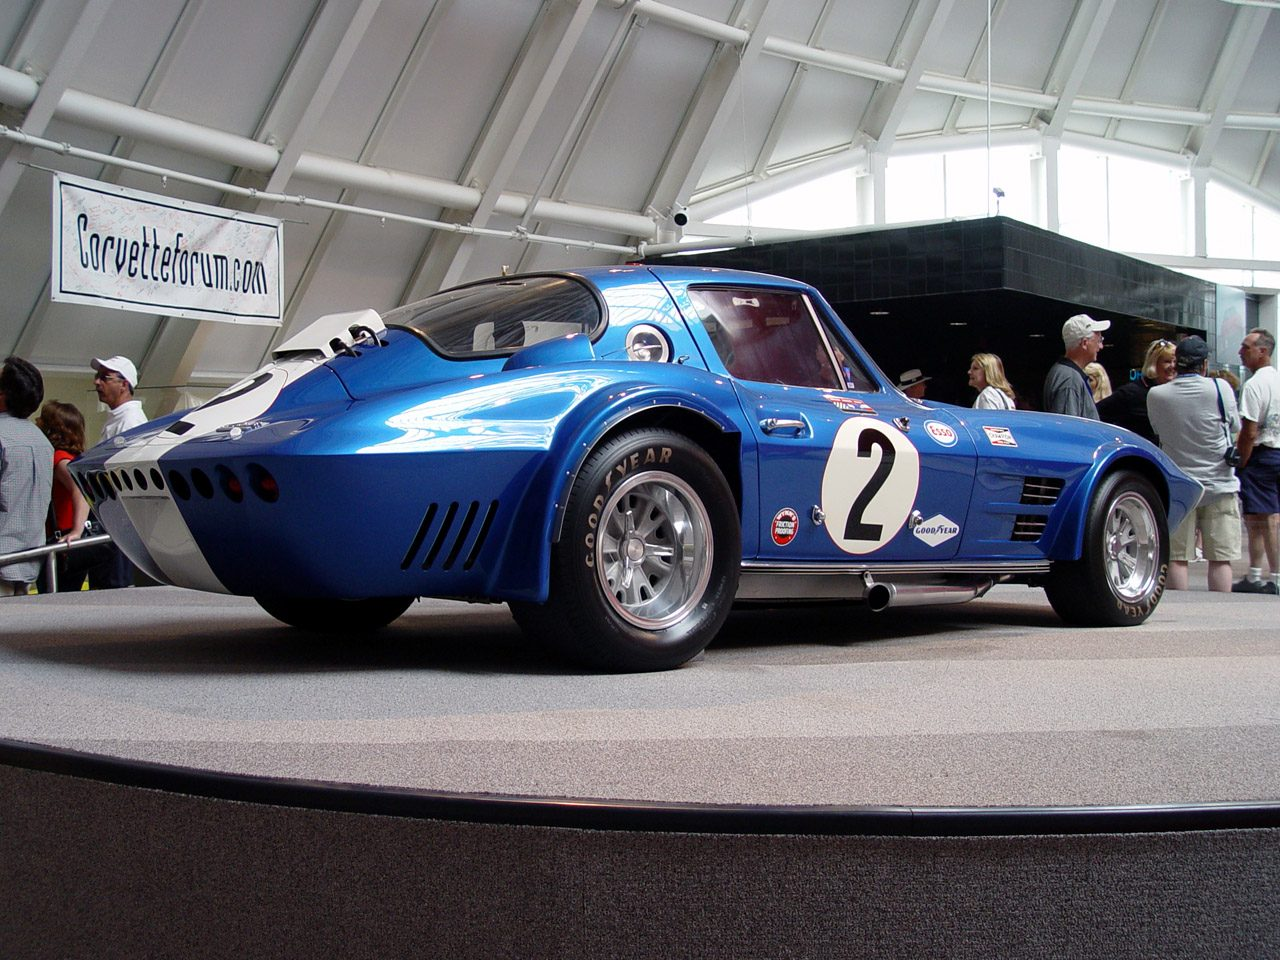 Chevrolet Corvette (C2) Grand Sport Race Car 1963